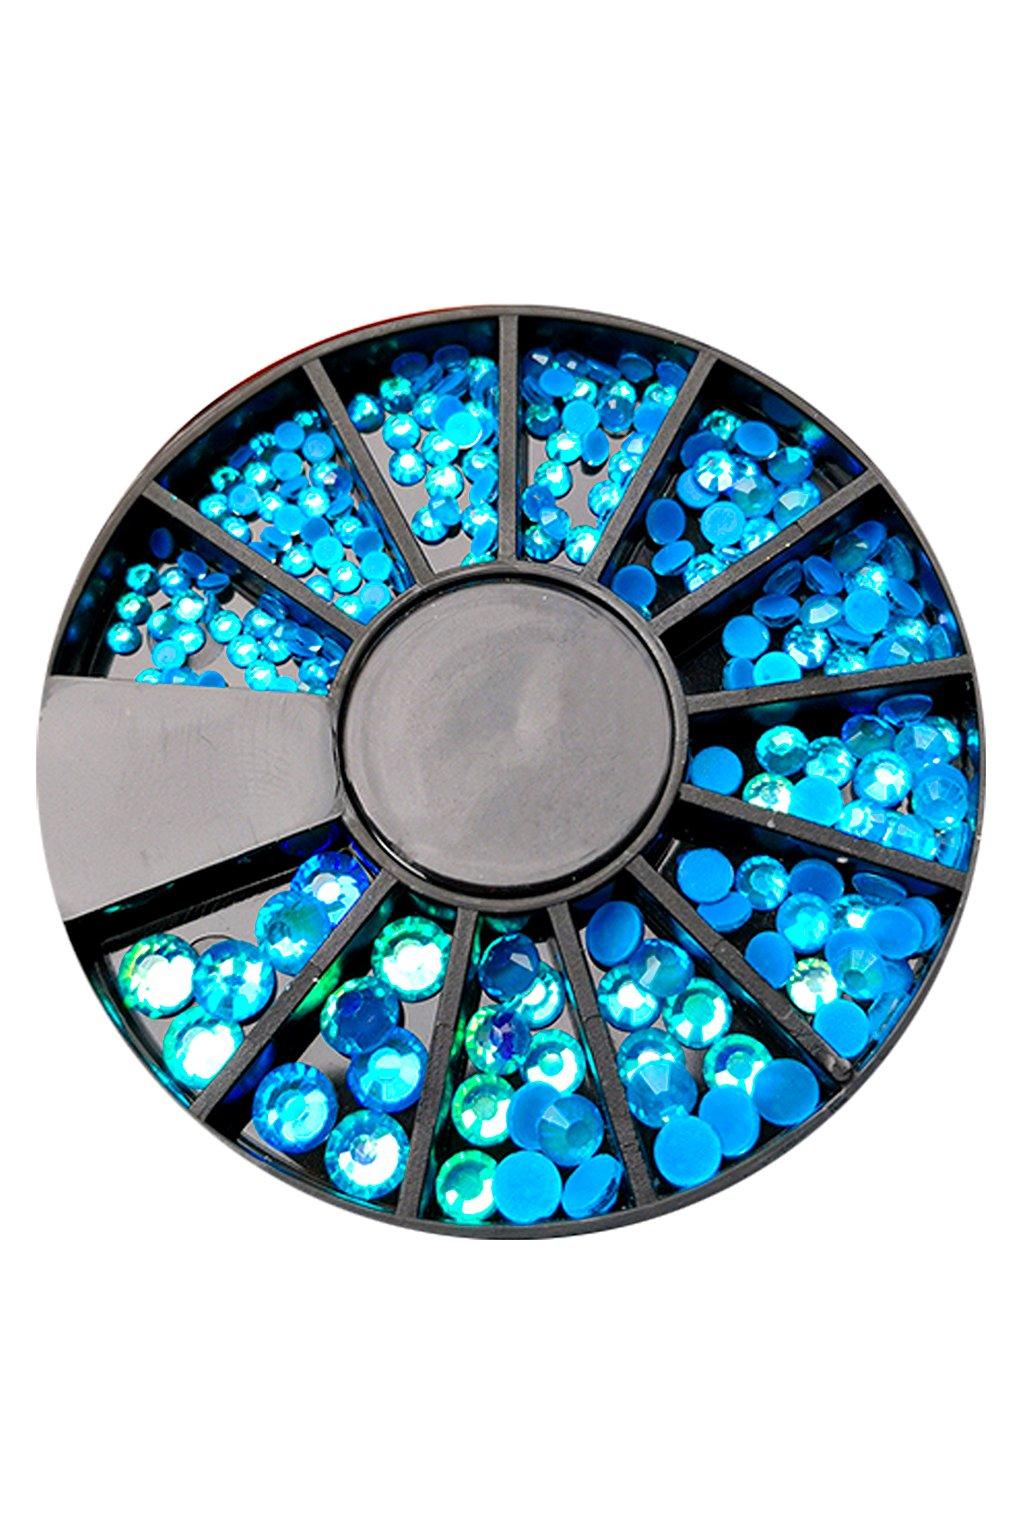 Karusel kamínku Neon Blue náhled